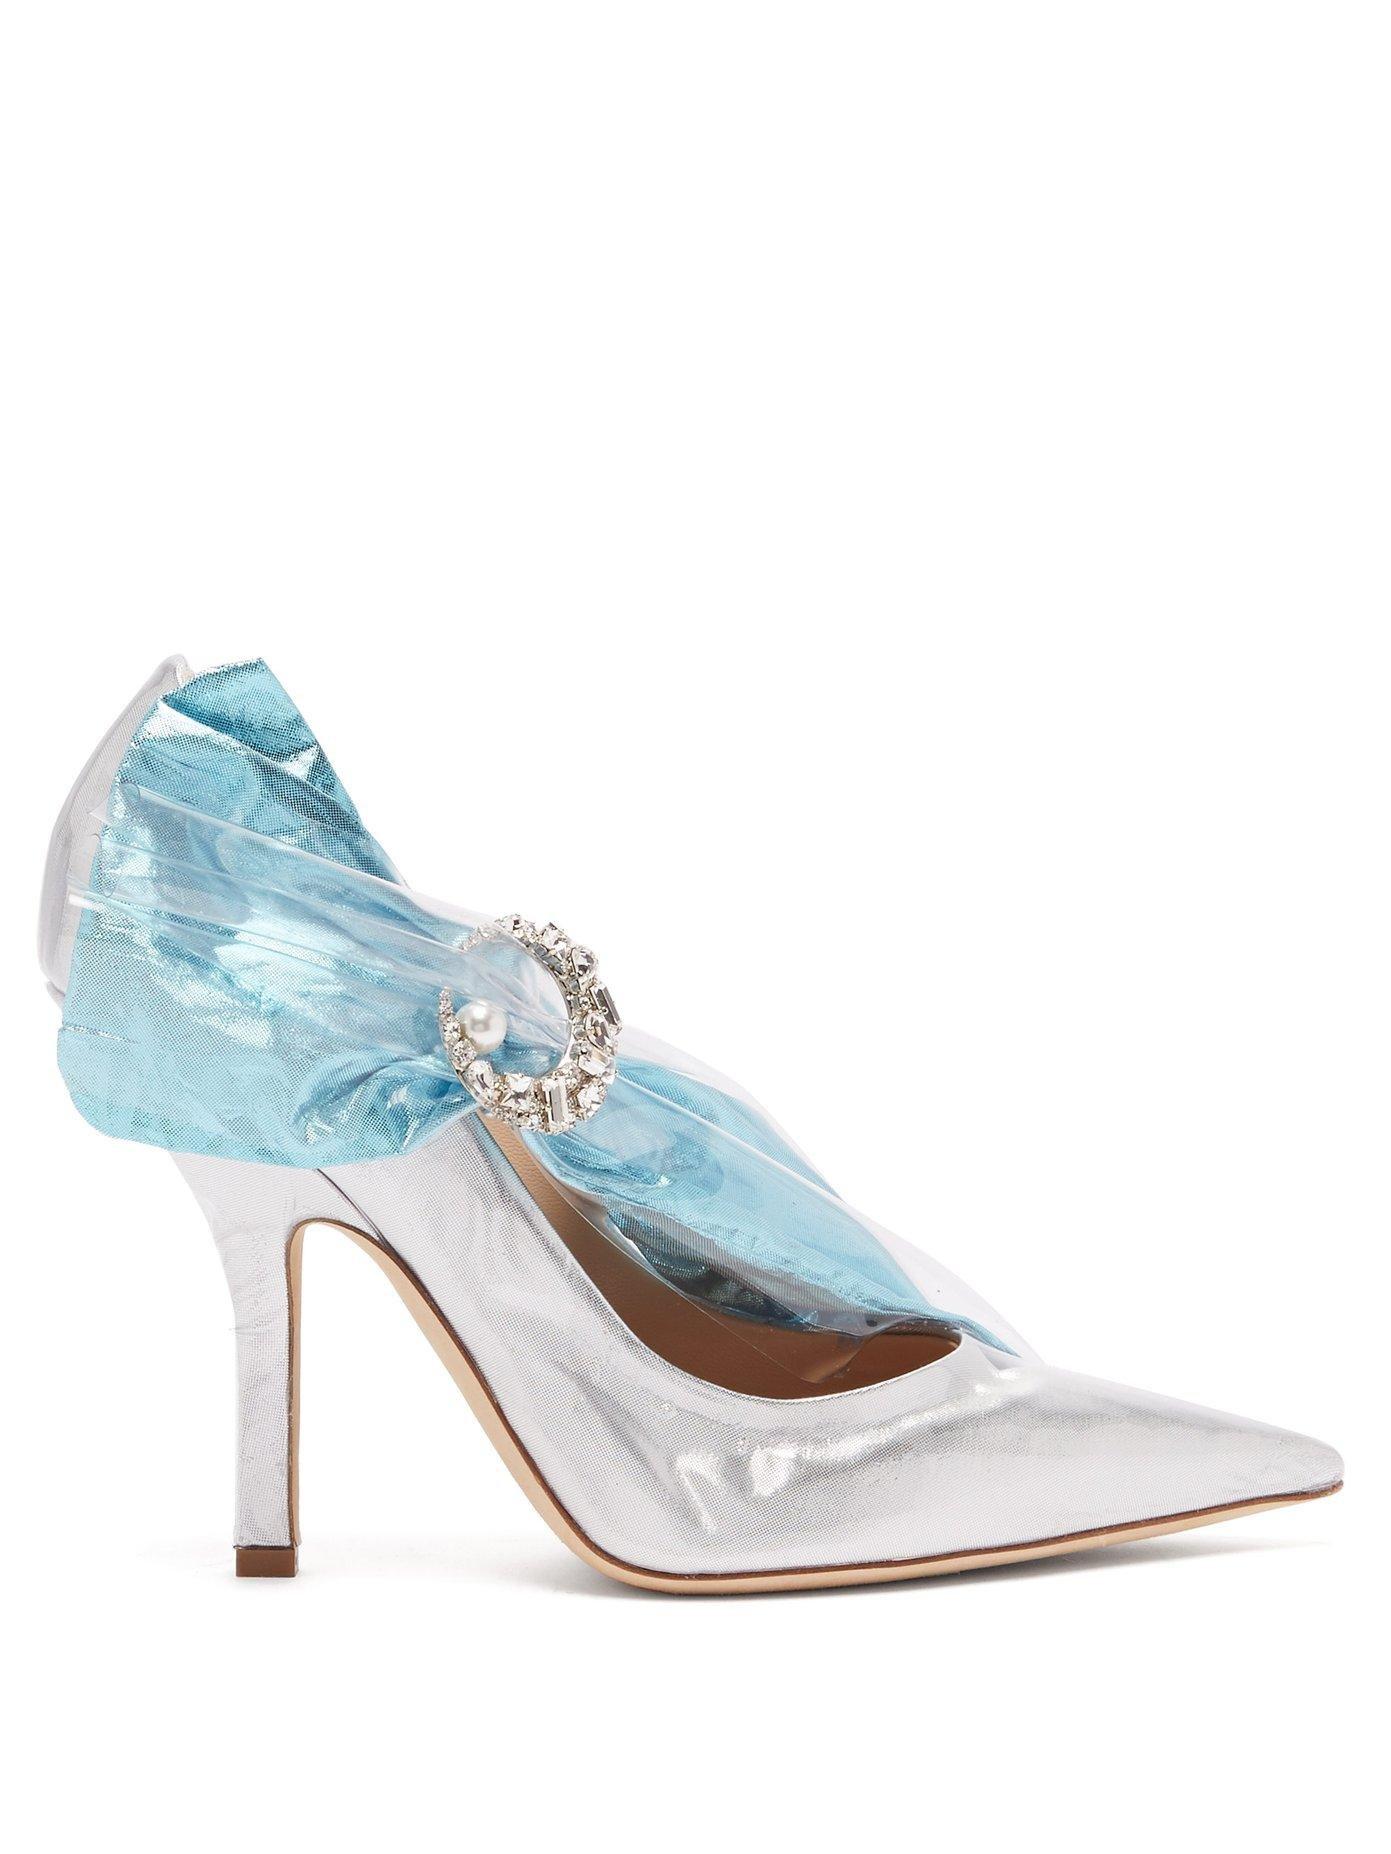 6354391a6 أكثر من 20 موديل أحذية عرايس تناسب أسلوبك يوم الزفاف مهما كان